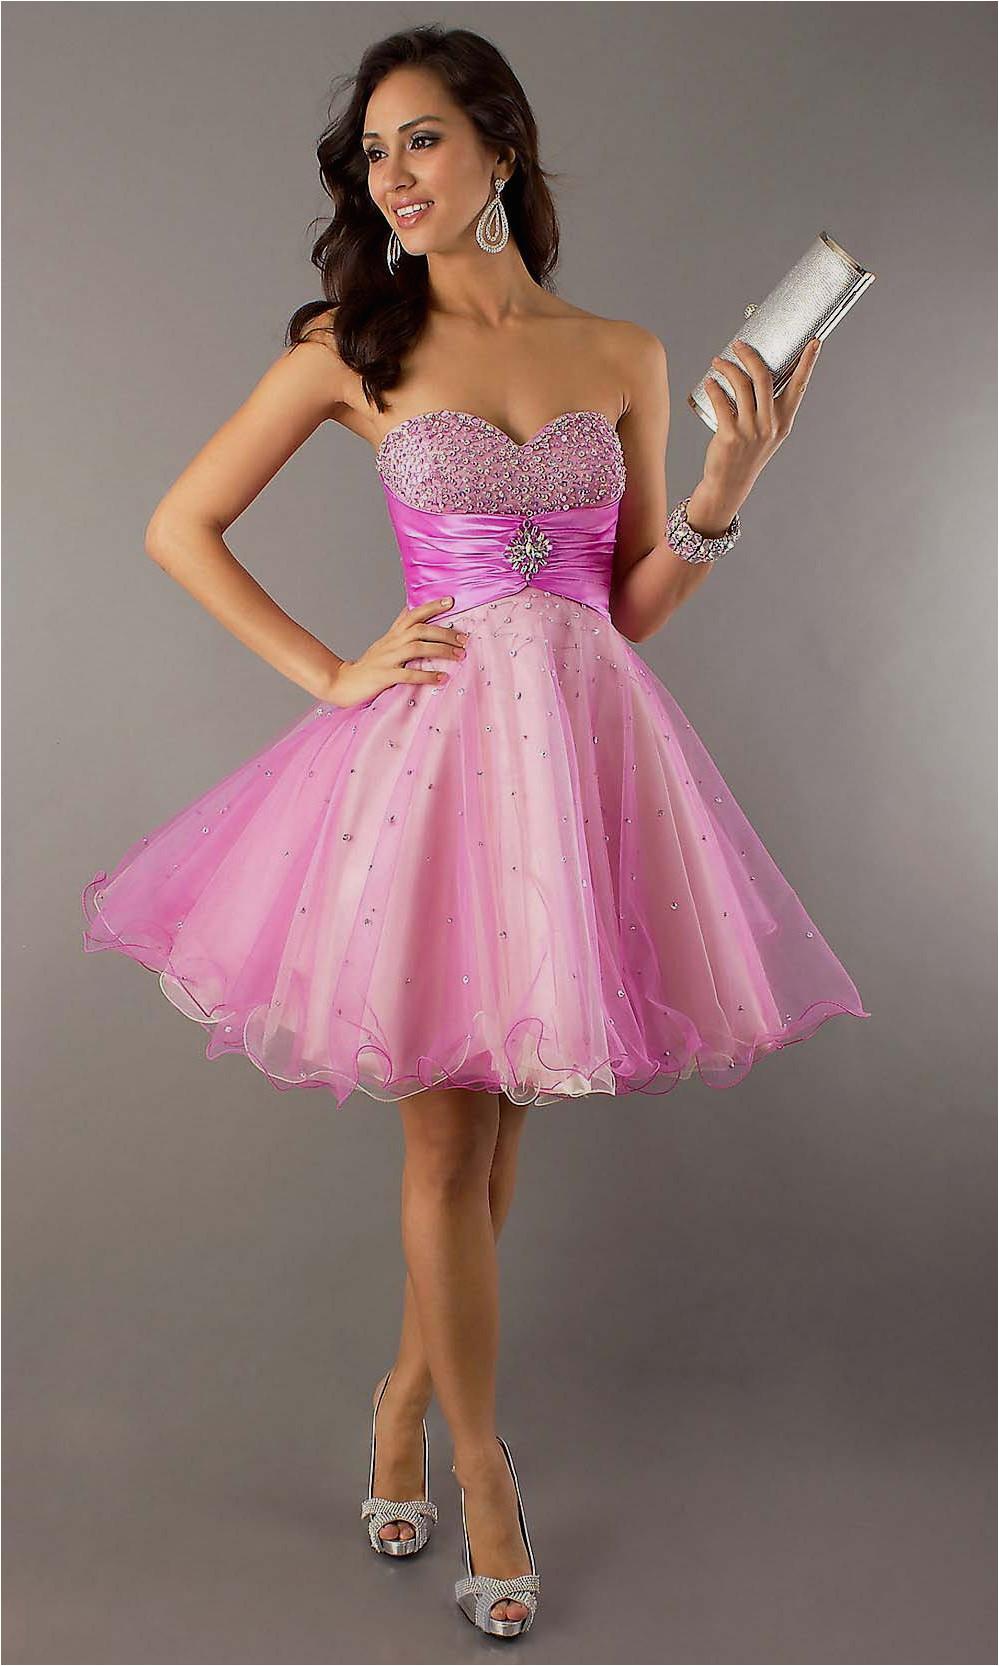 Birthday Dresses for Teenagers Pink Dresses for Teenage Girls Naf Dresses